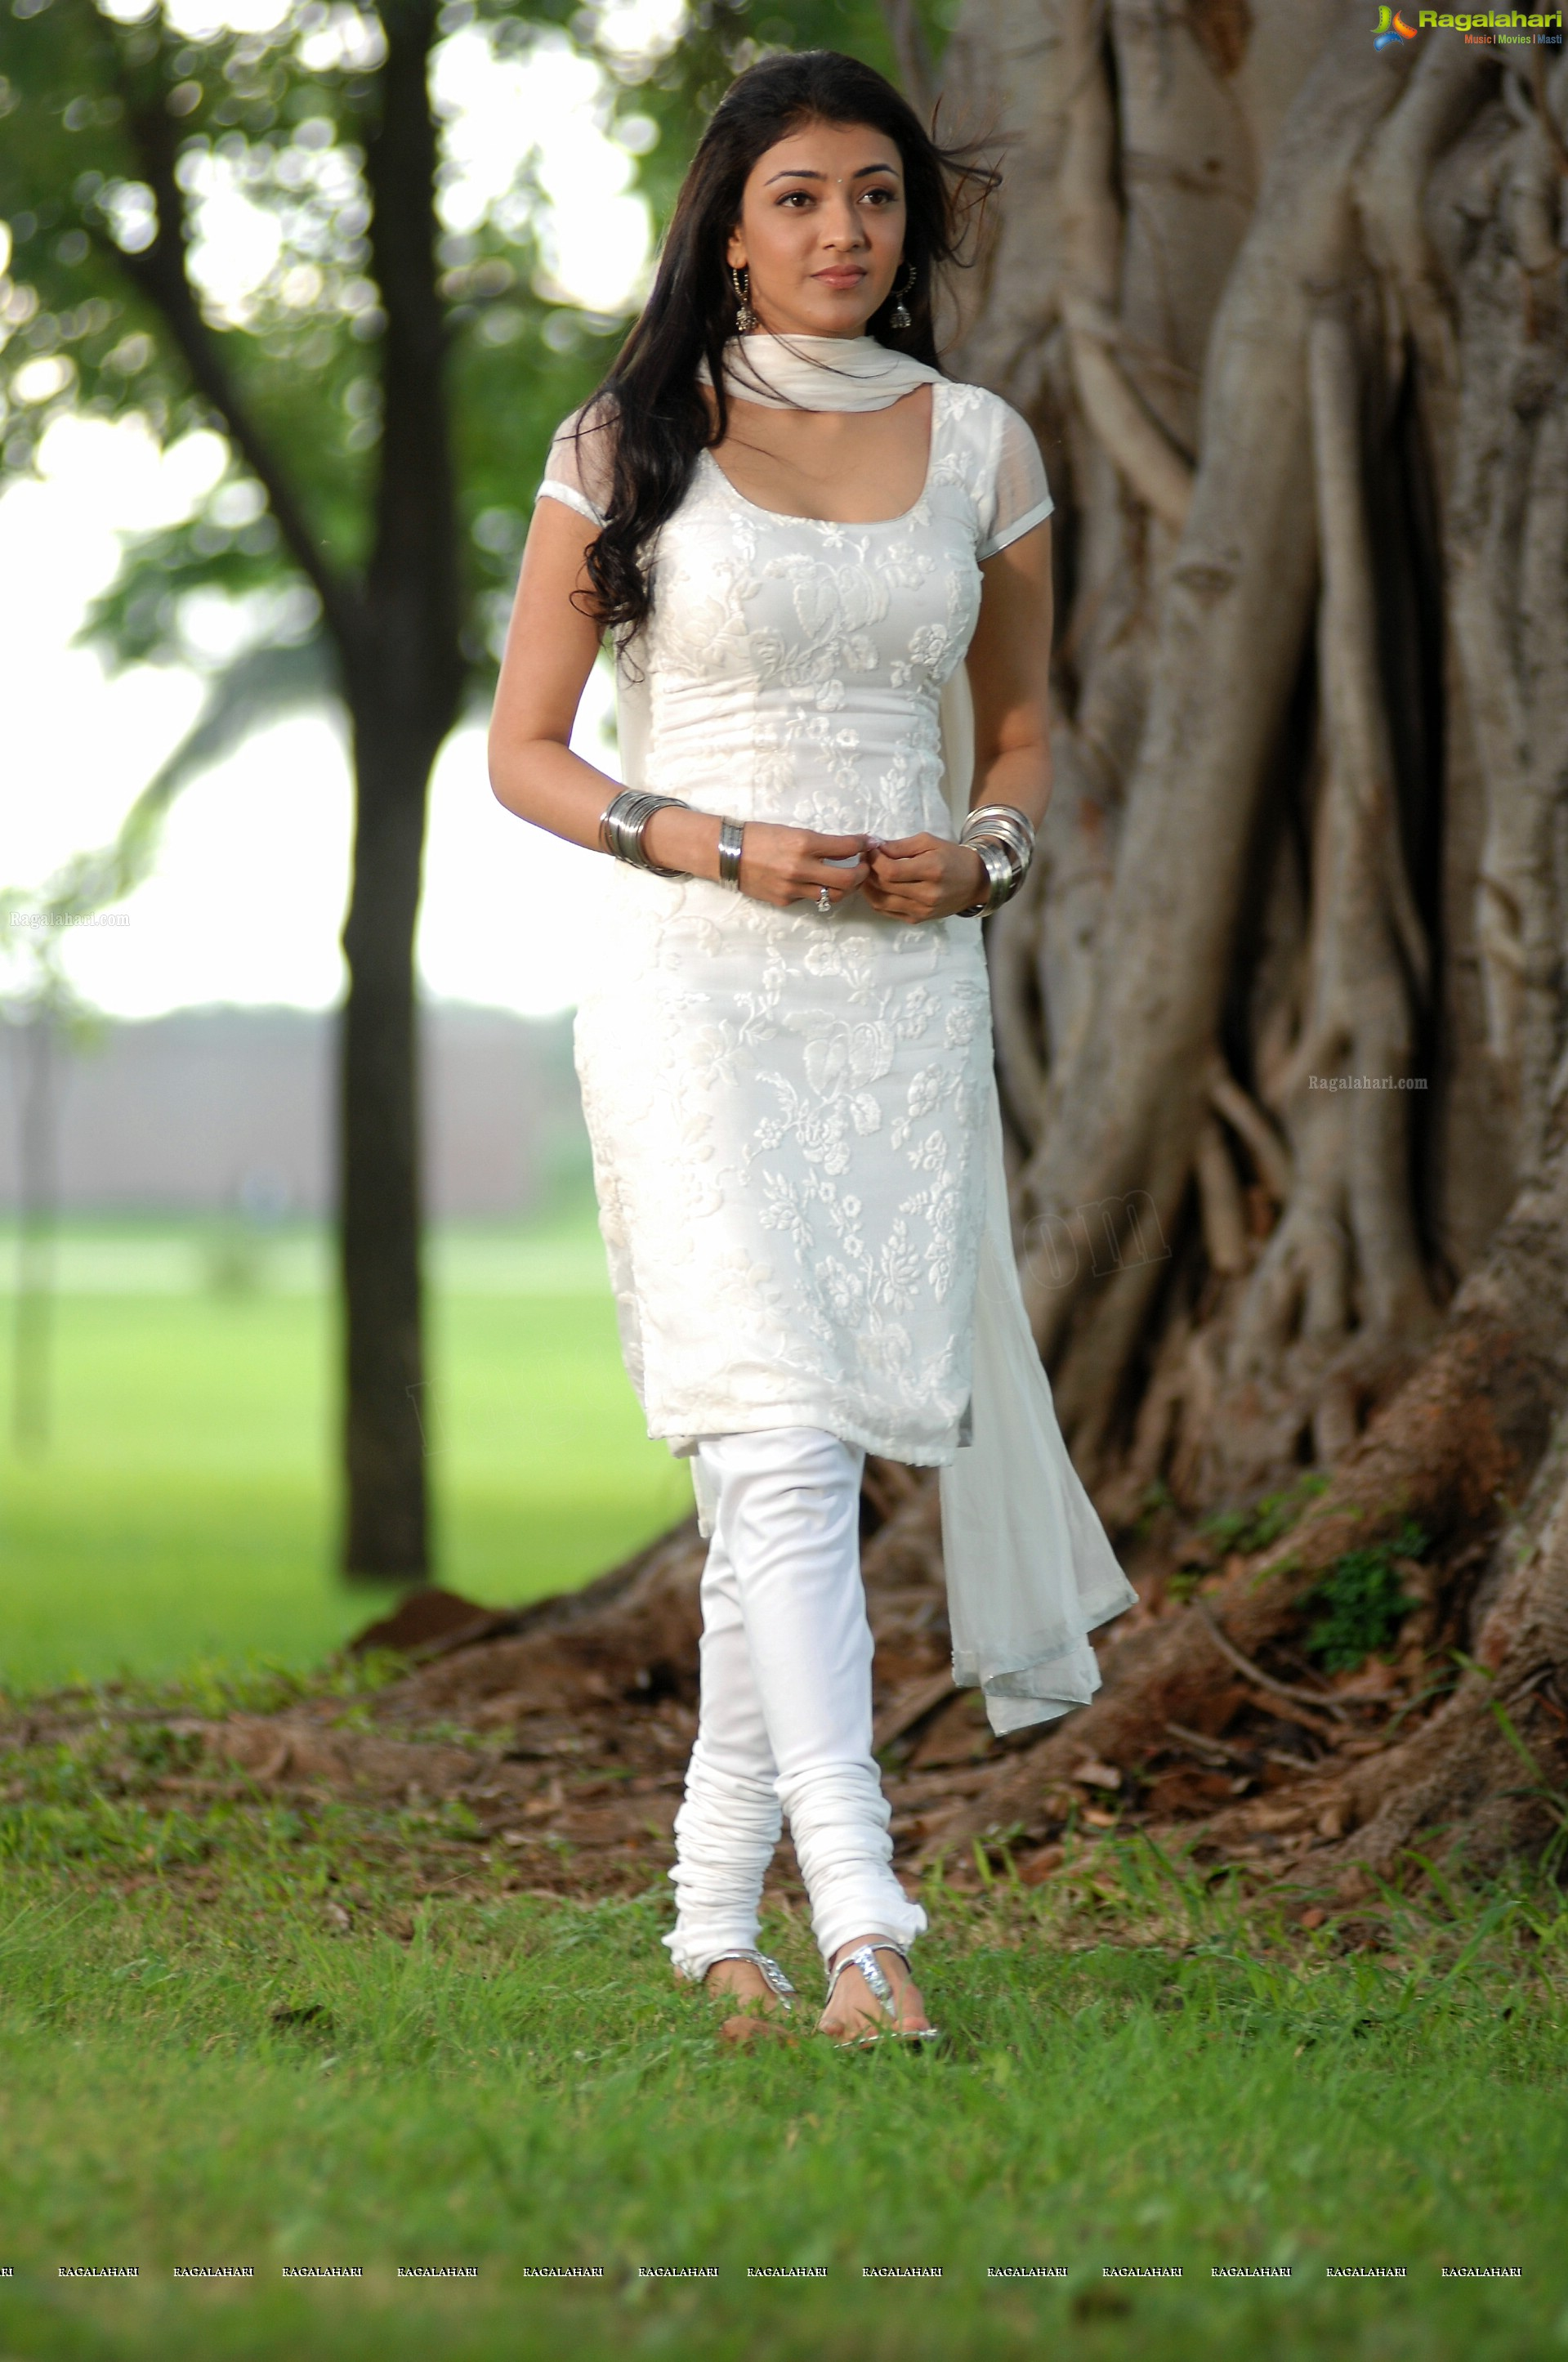 kajal agarwal (hd) image 50 | telugu heroines images,telugu actress